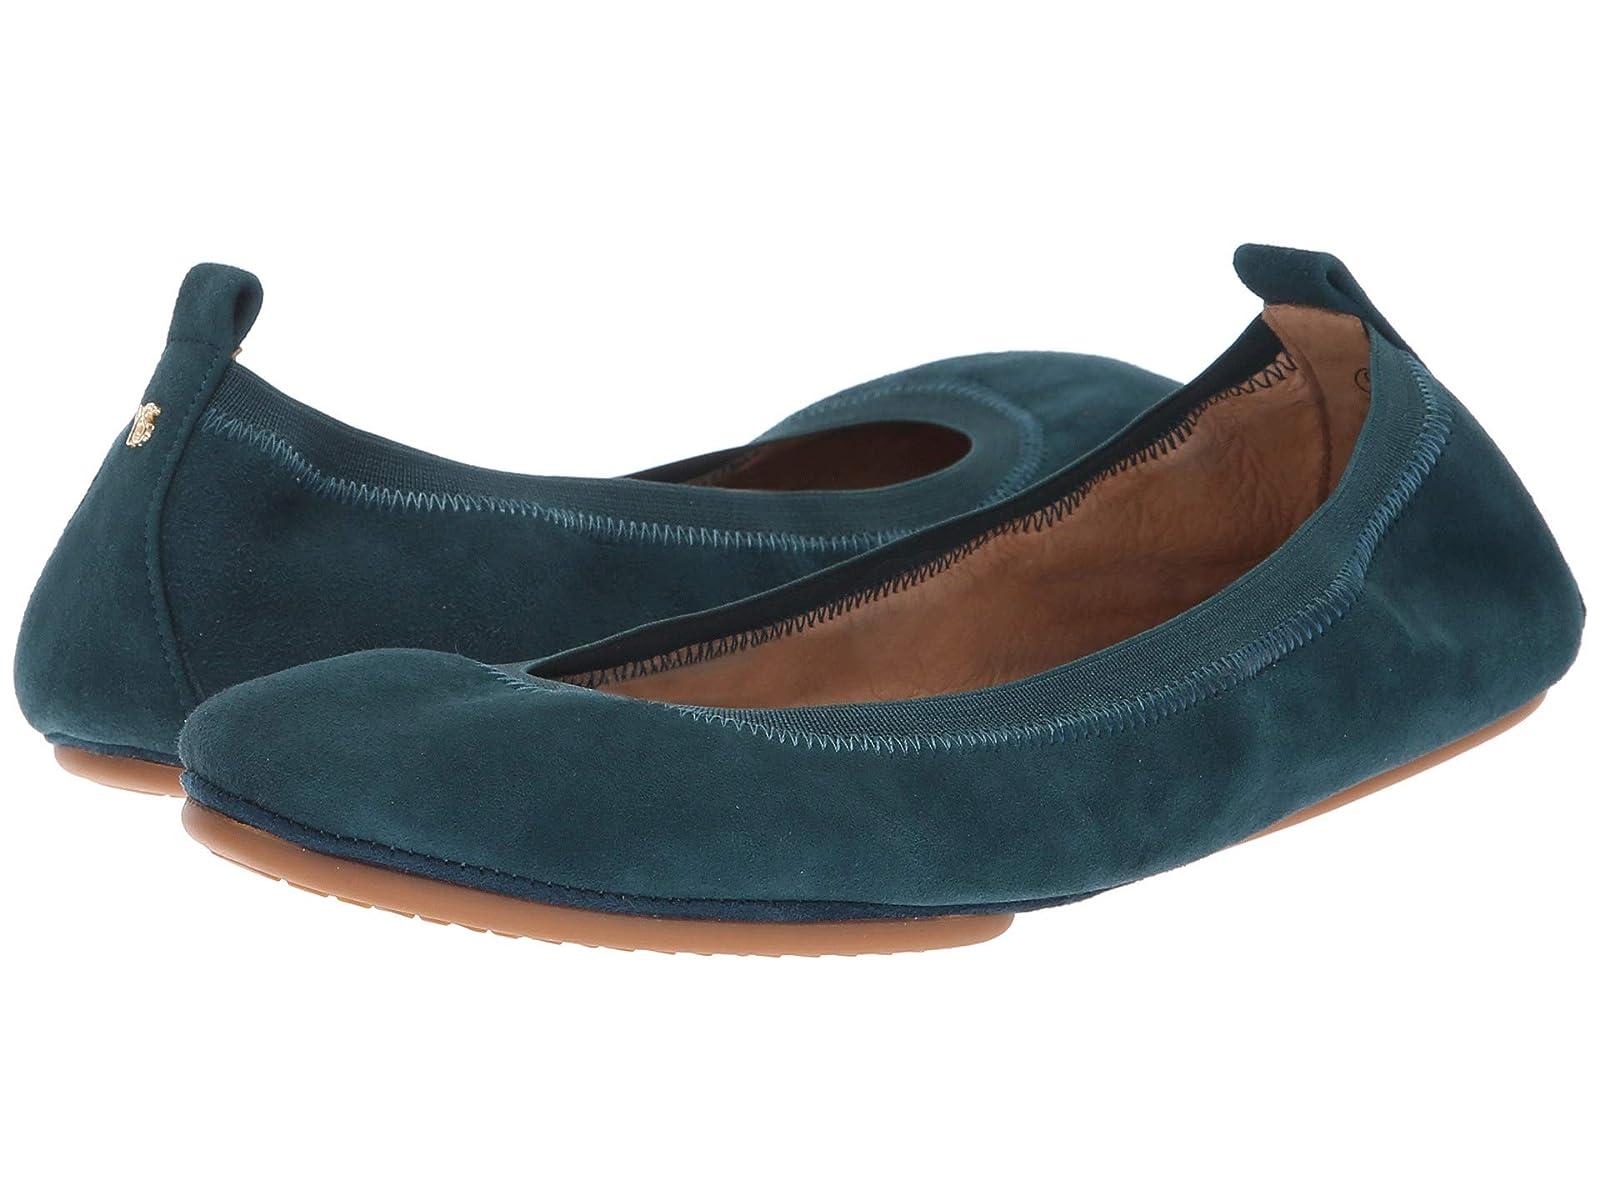 Yosi Samra SamaraAtmospheric grades have affordable shoes